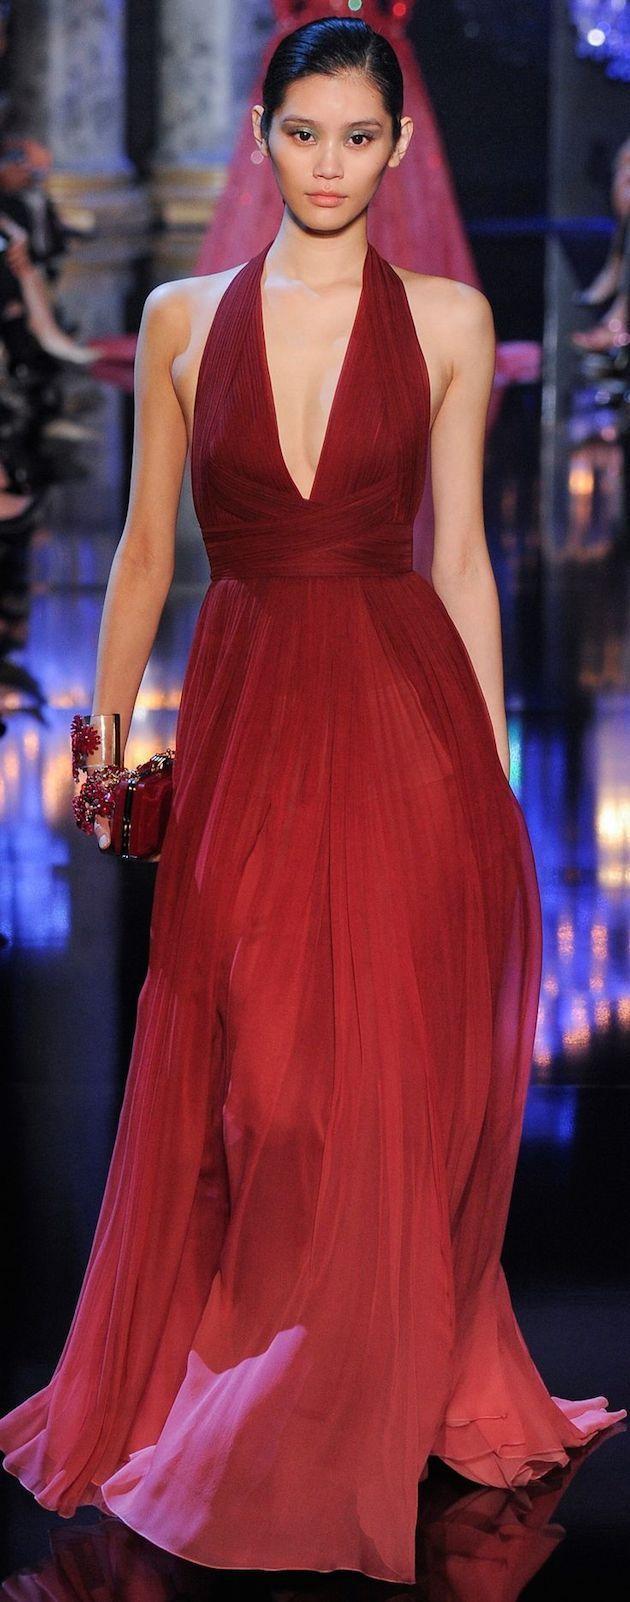 vestido-marsala-madrinha   couture chic   Pinterest   Kostüm, Rot ...